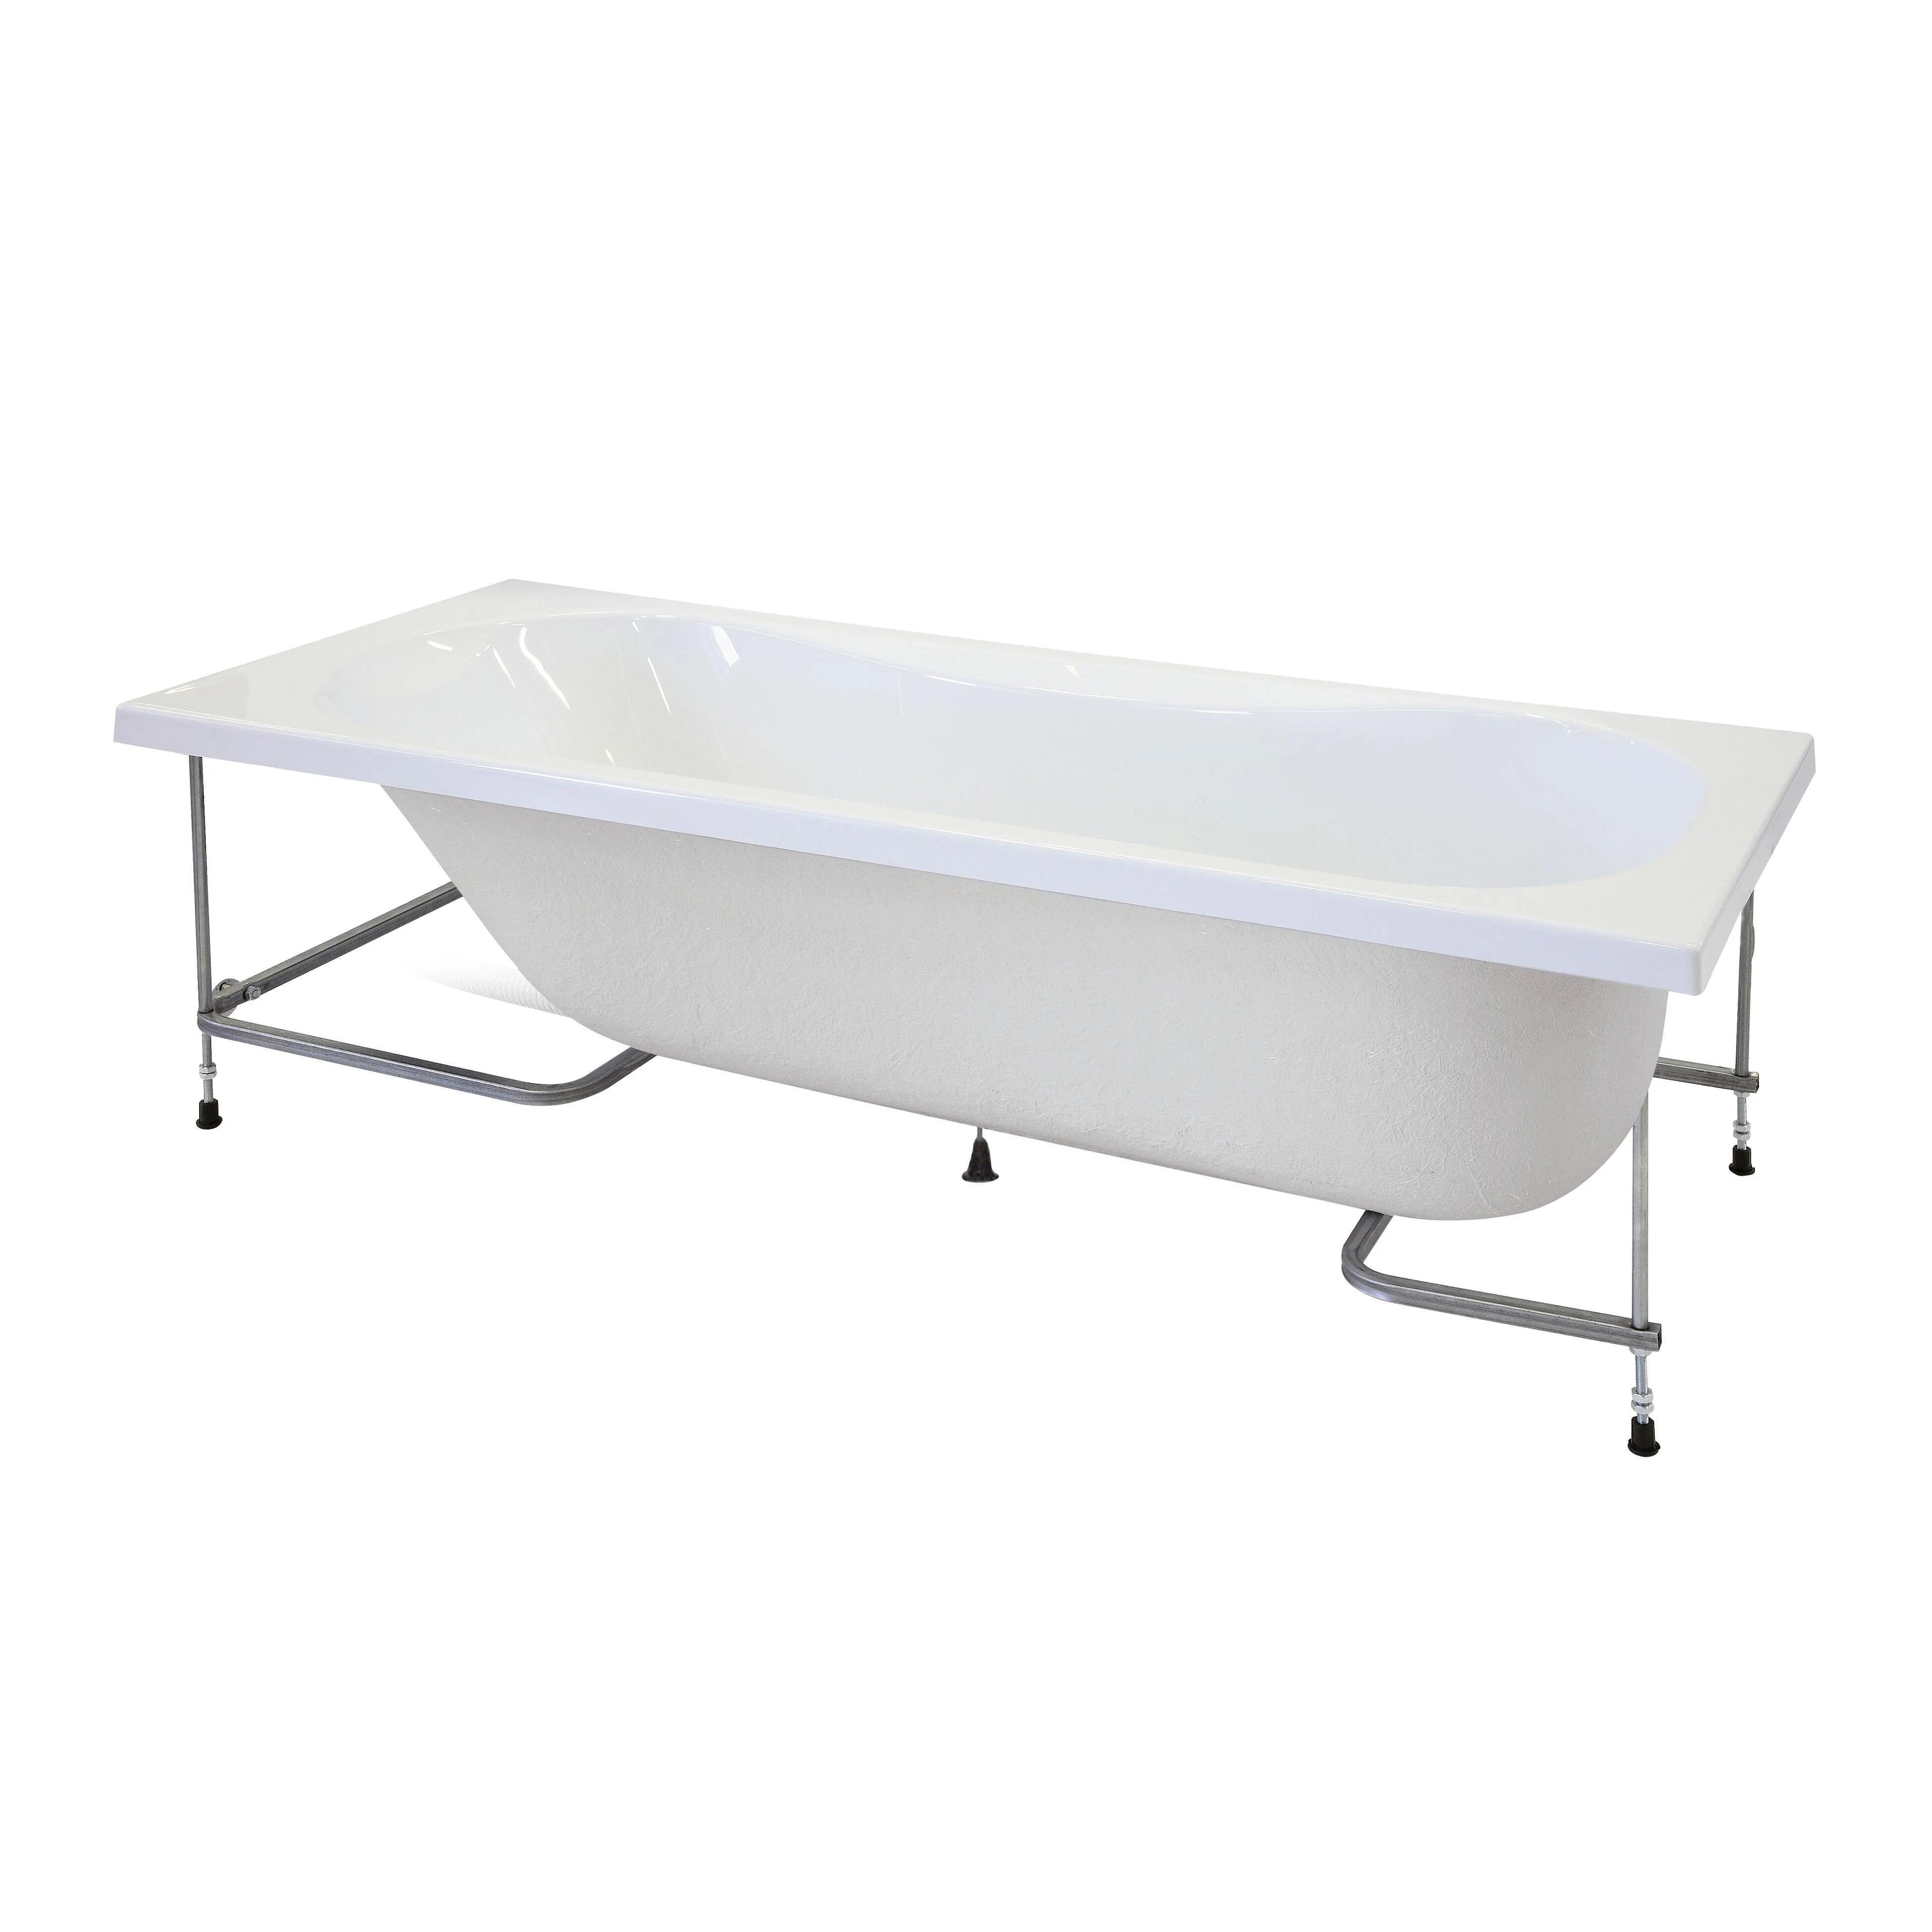 Tenda da bagno, design samo. Vasca E Telaio Egeria 170 X 80 Cm Bianco 030 Leroy Merlin